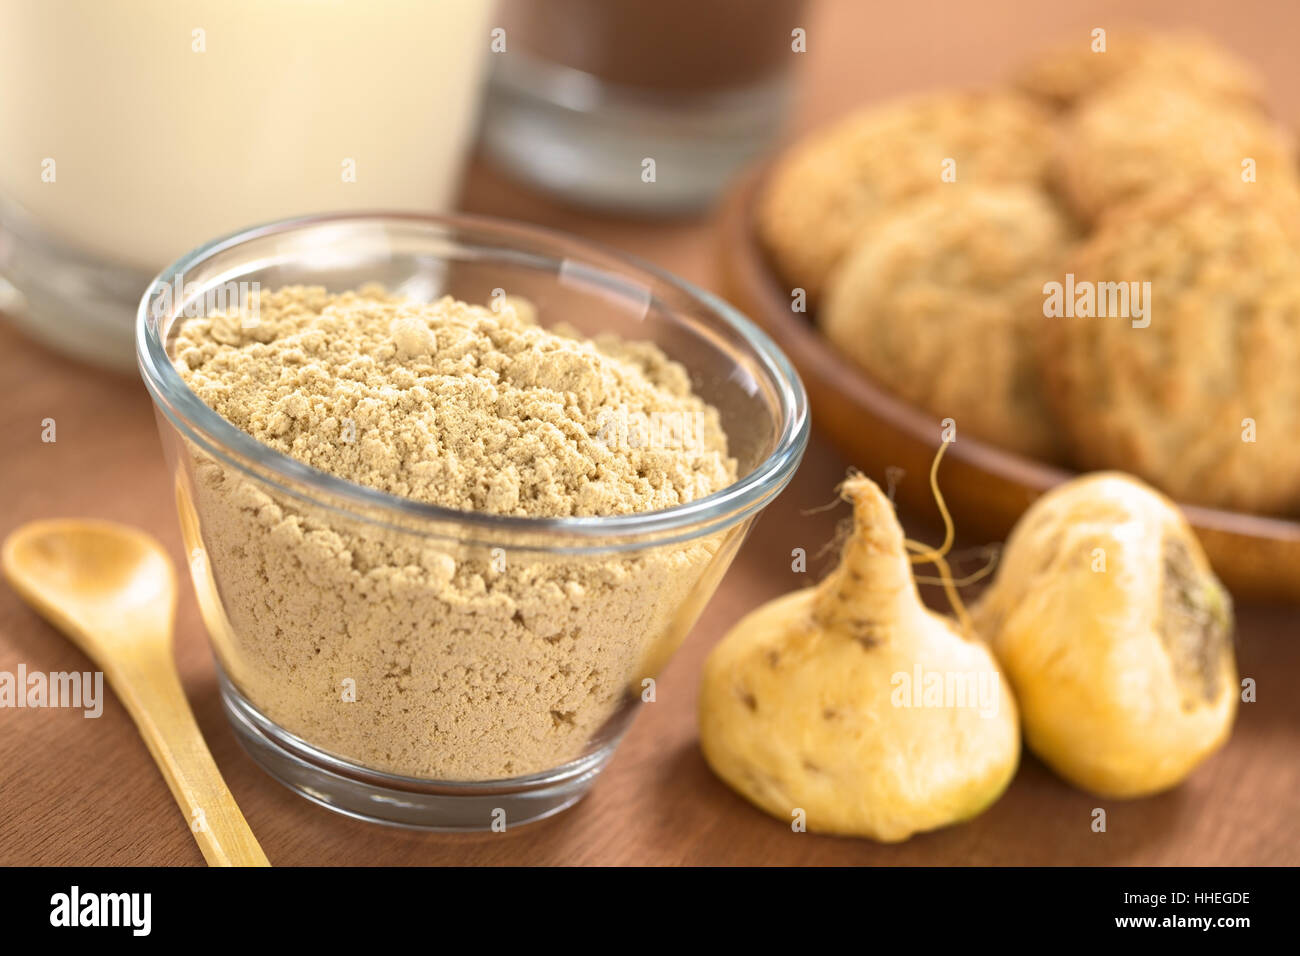 food, aliment, powder, food, aliment, drink, horizontal, milk, vegetable, Stock Photo